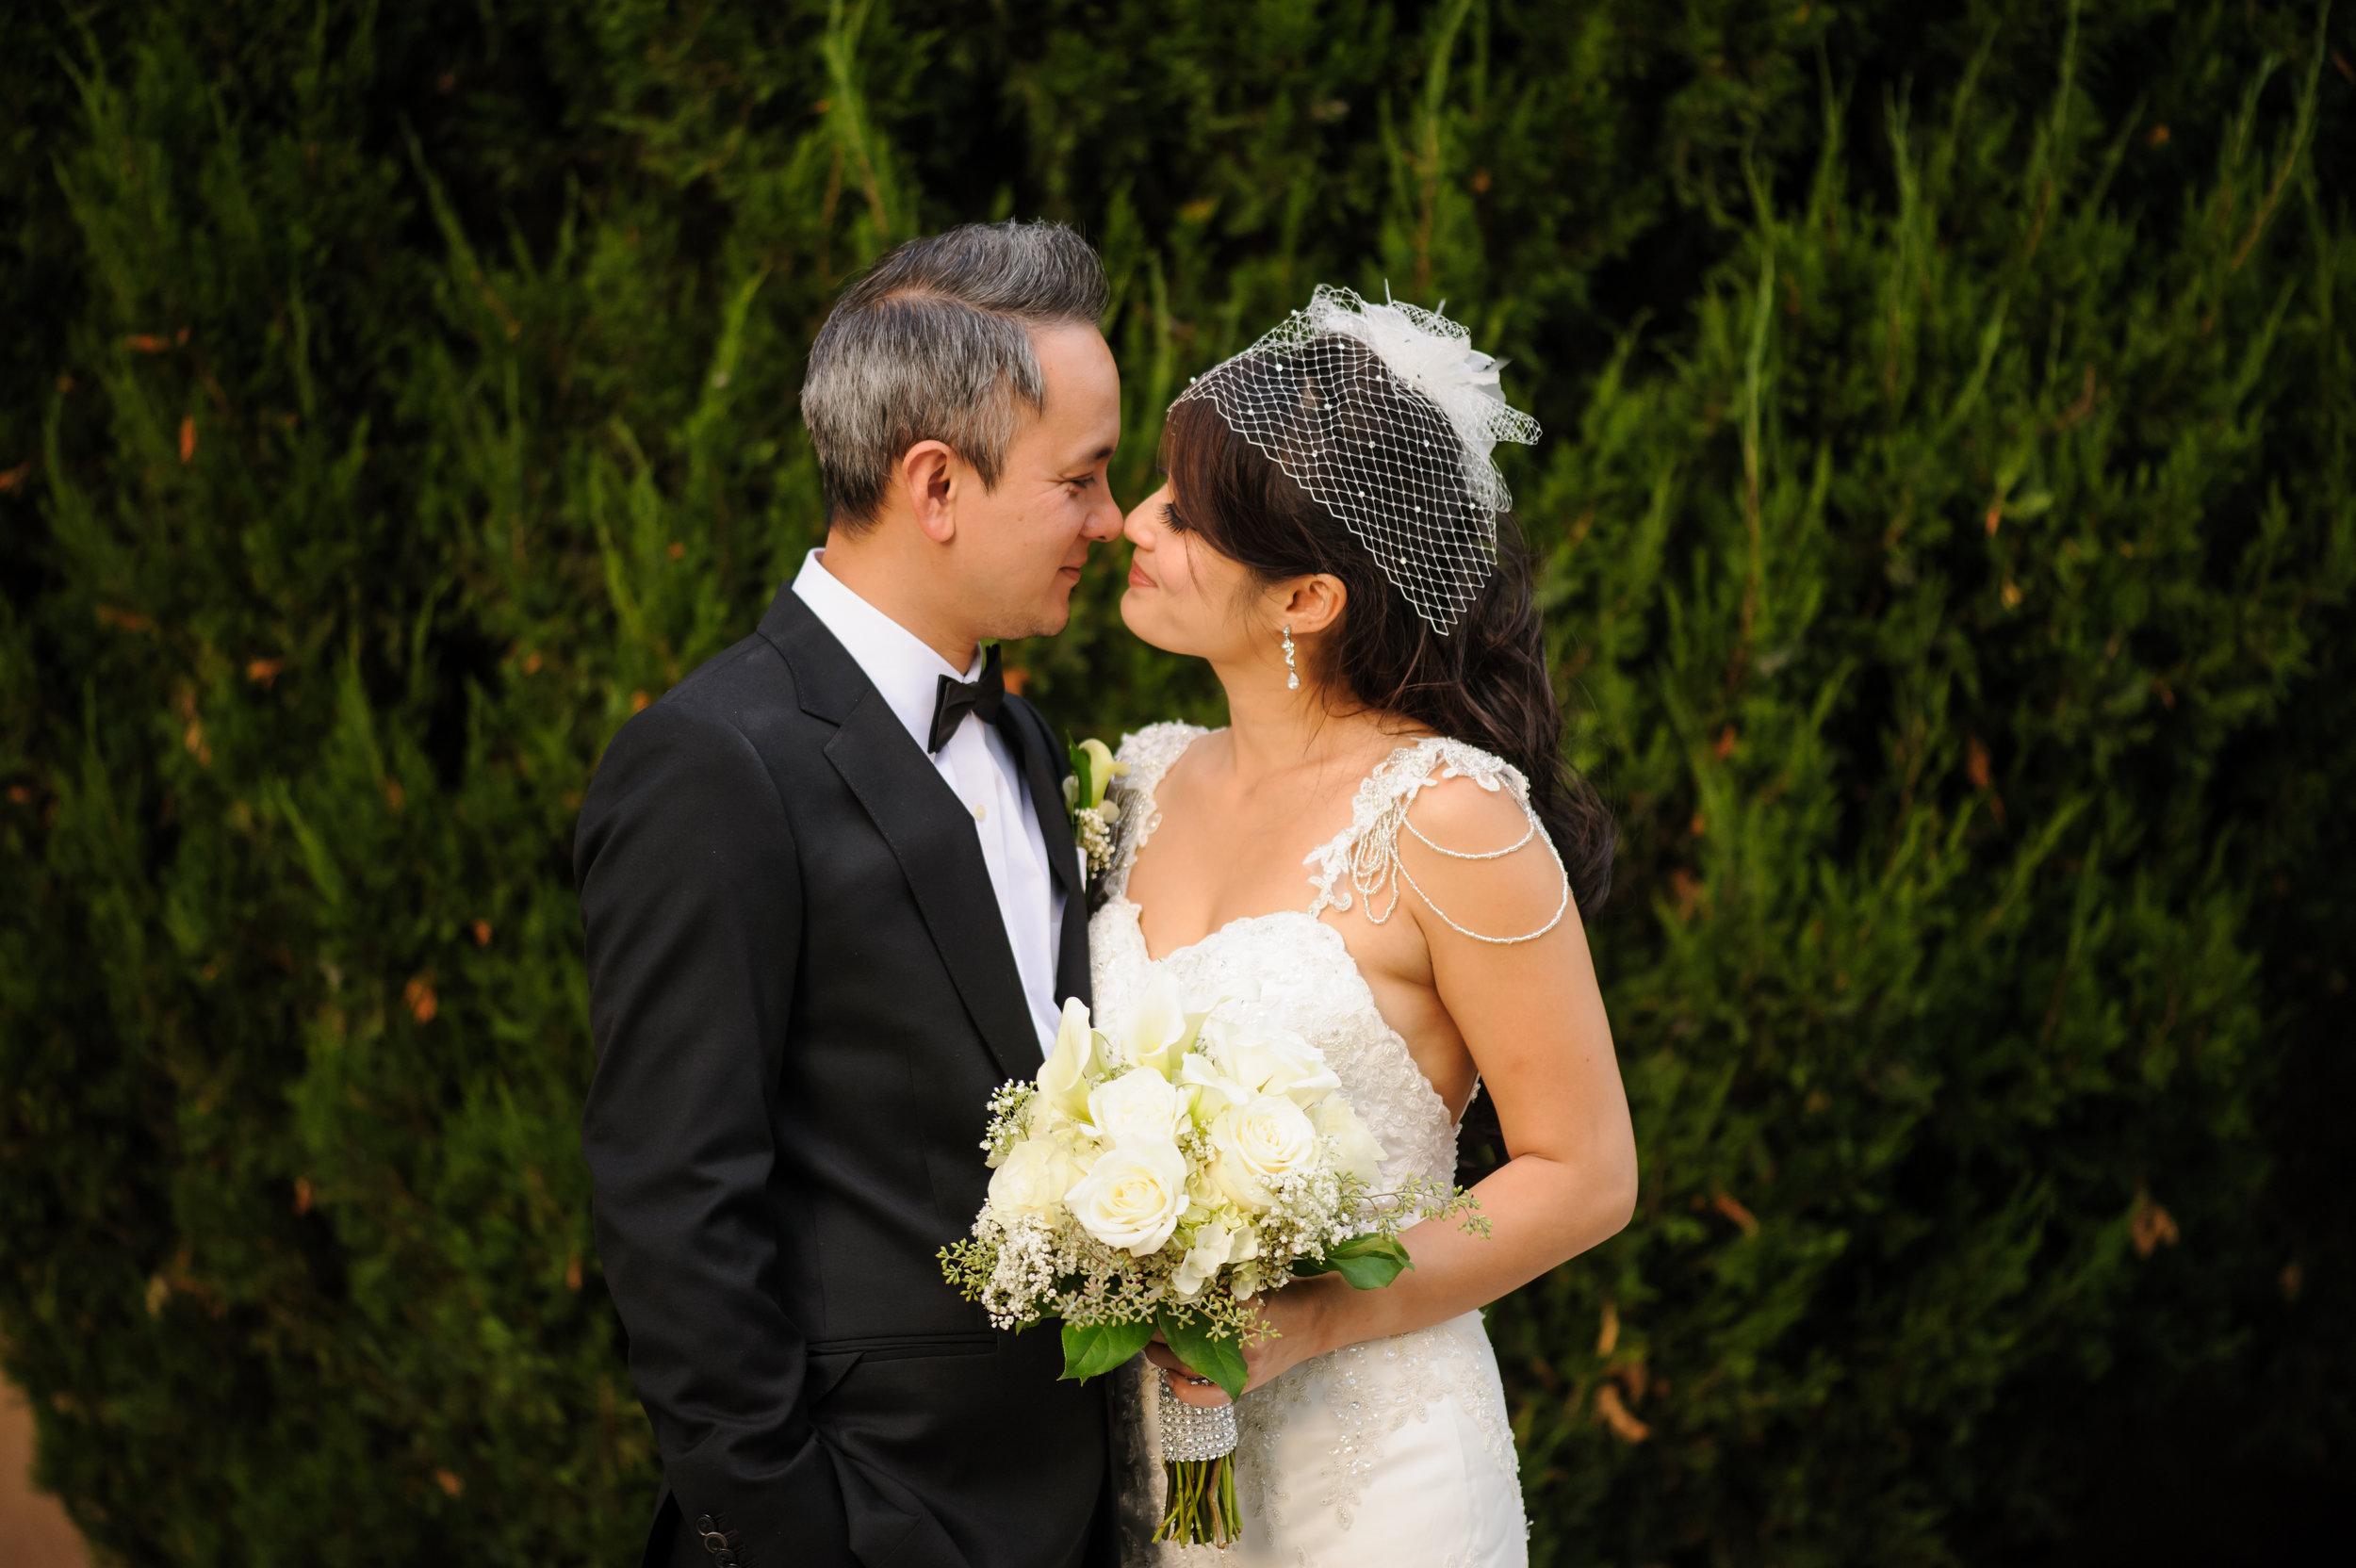 camilla-thuy-069-memorial-auditorium-sacramento-wedding-photographer-katherine-nicole-photography.JPG